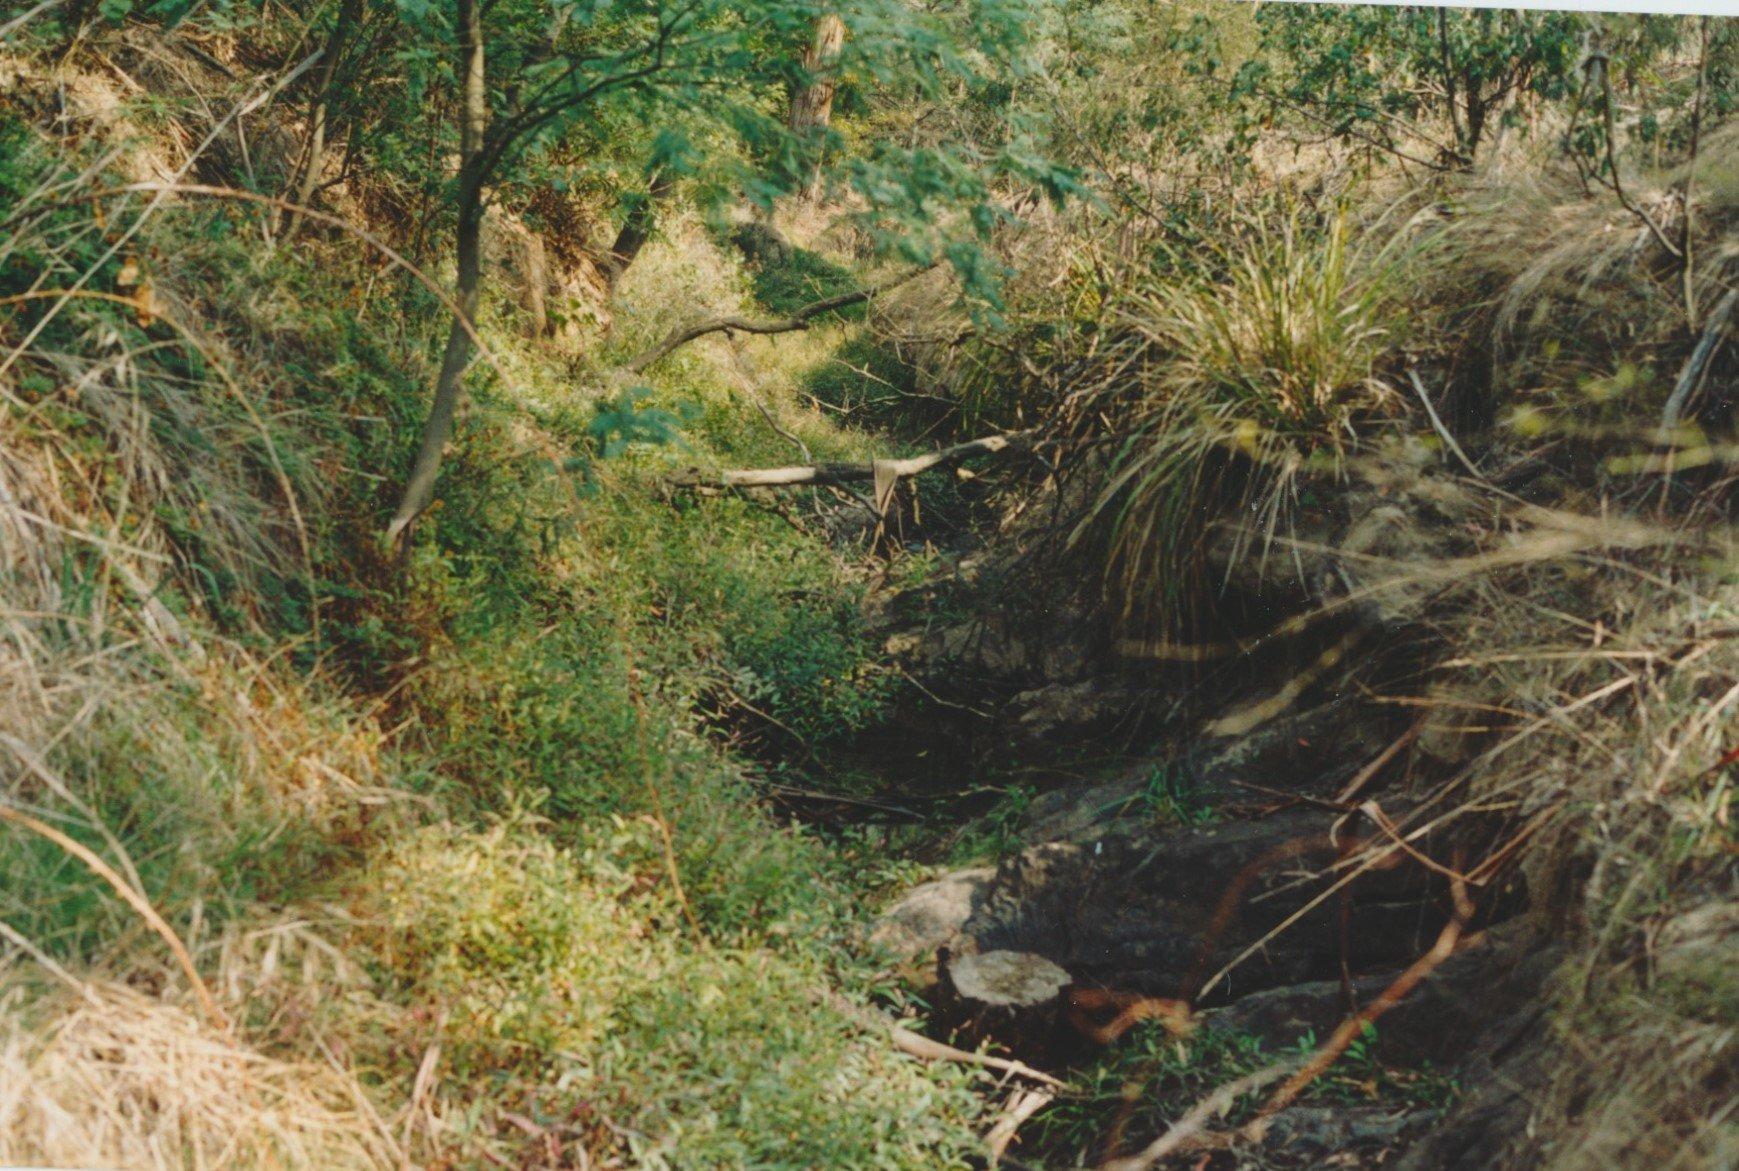 The Arthurs Creek below the site of the Shepherd's Hut, 2003